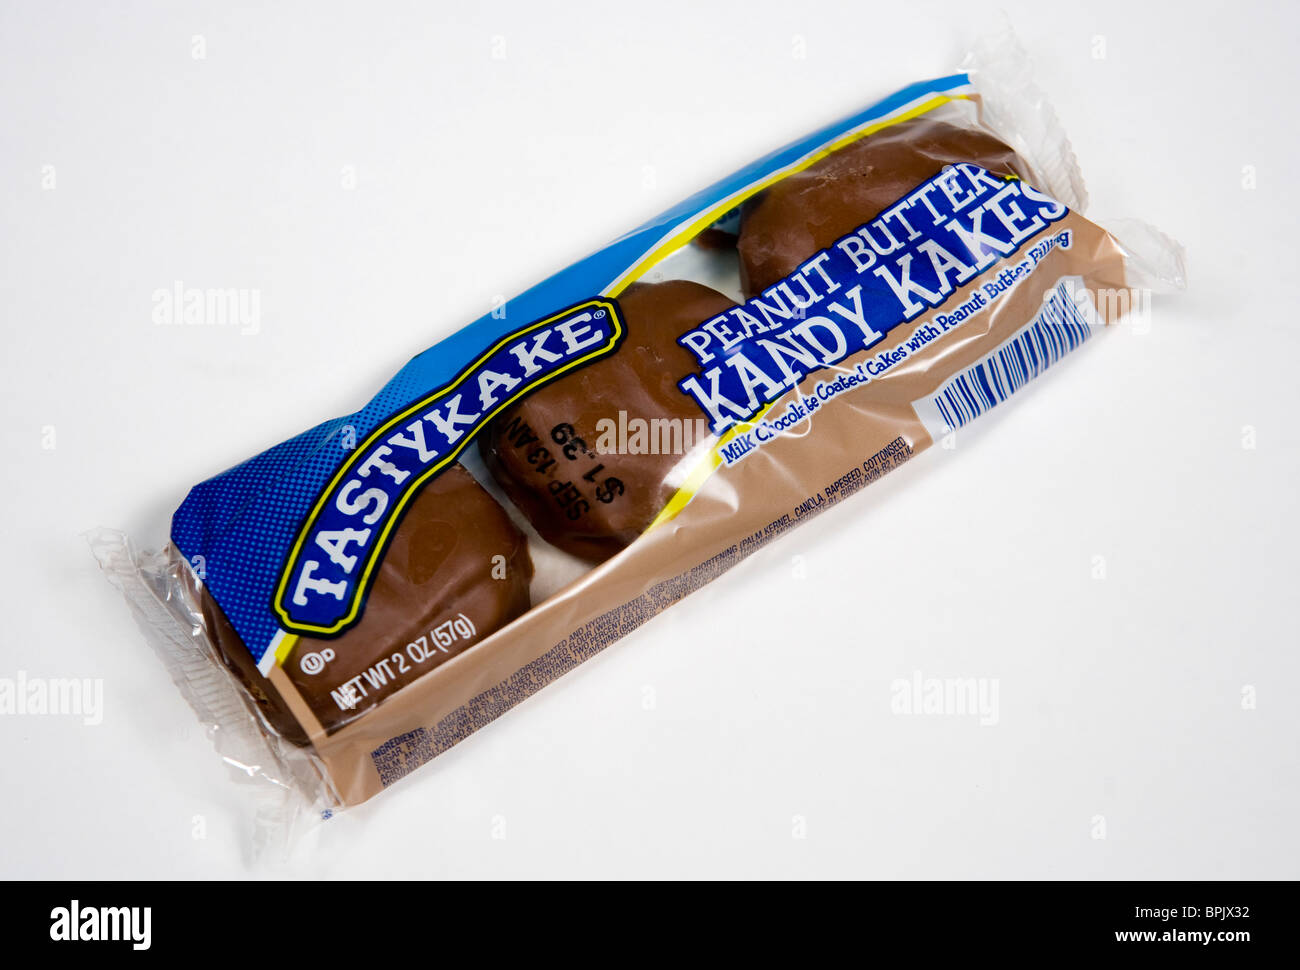 Tastykake Peanut Butter Kandy Kakes. - Stock Image